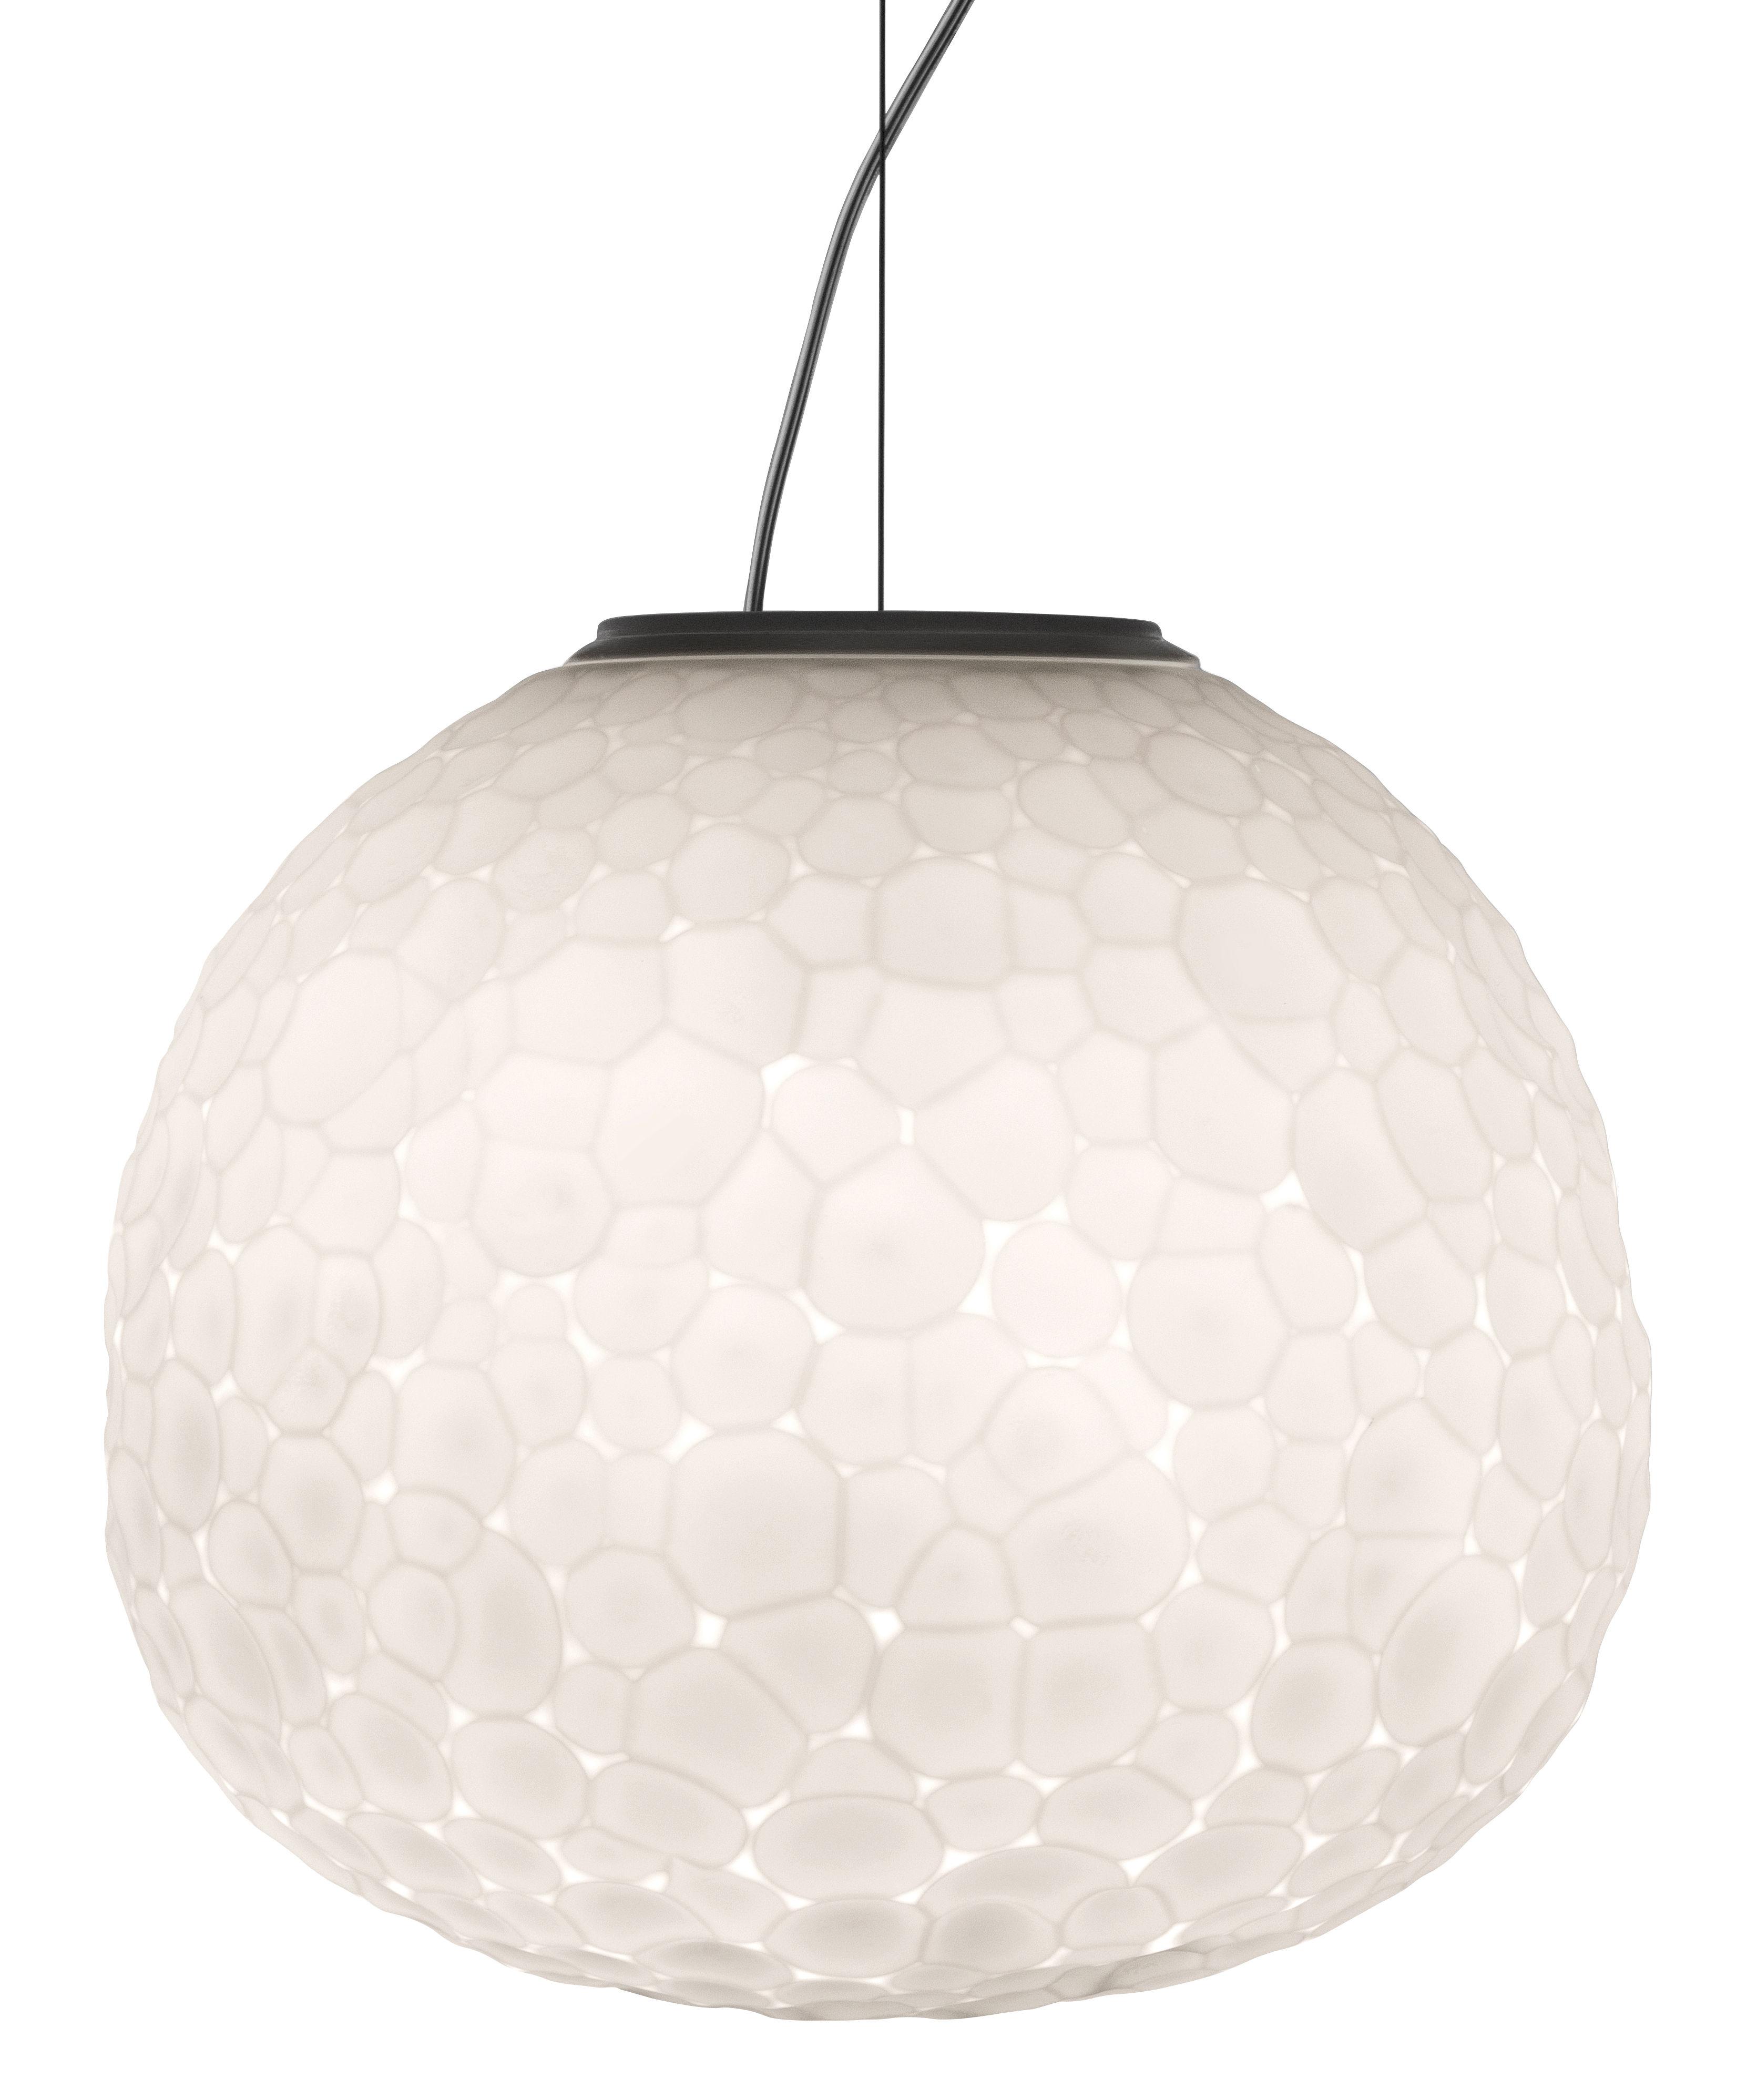 Illuminazione - Lampadari - Sospensione Meteorite - / Ø 35 cm di Artemide - Bianco - vetro soffiato